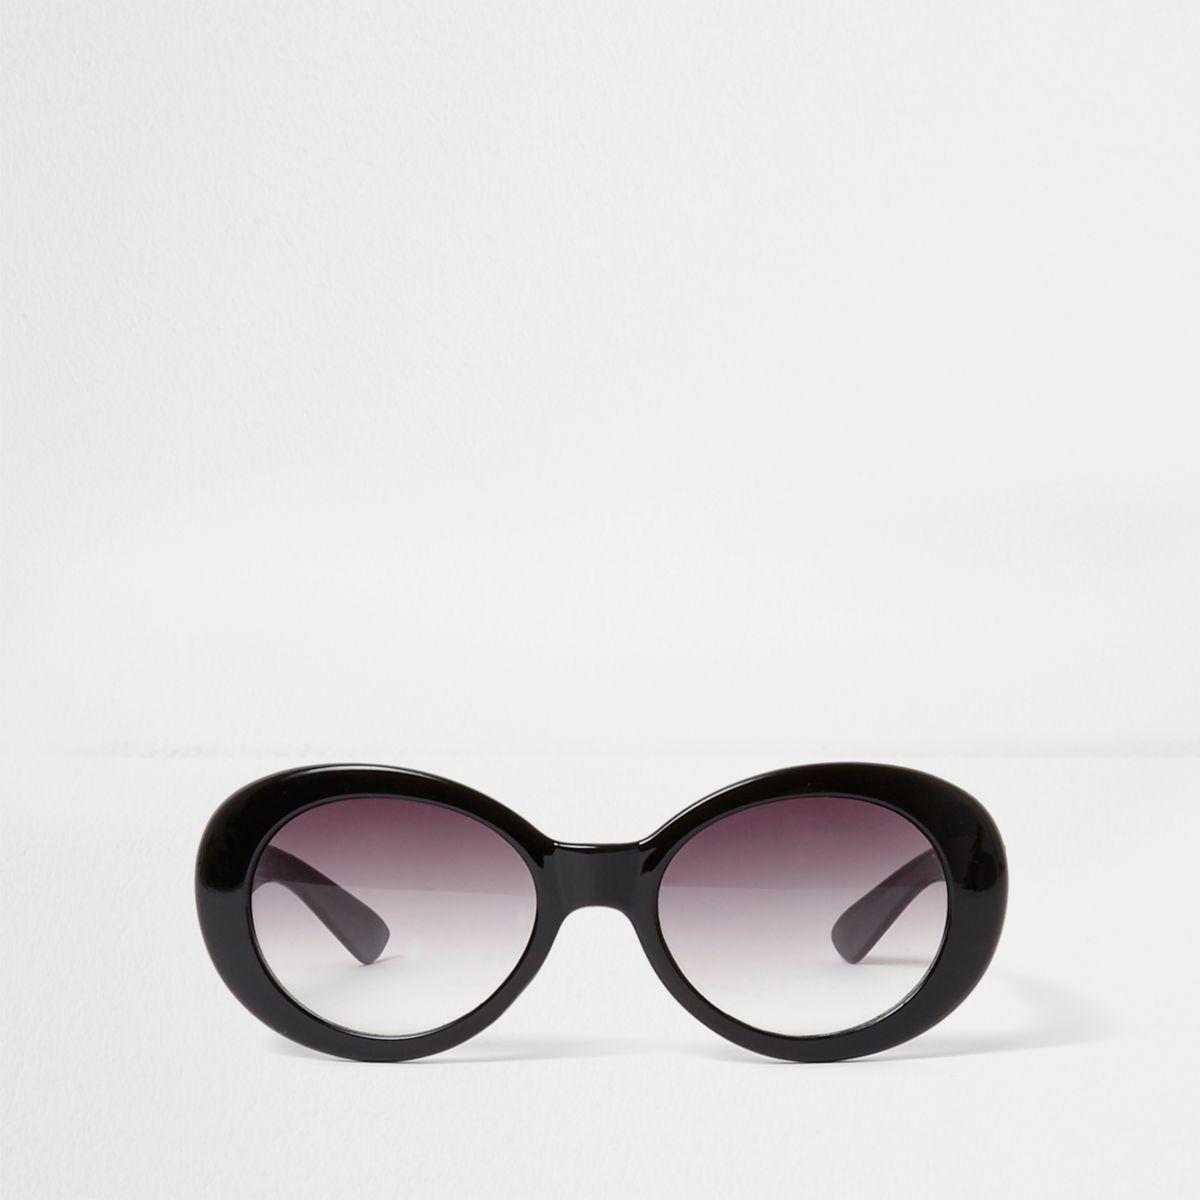 Girls black oval retro style sunglasses